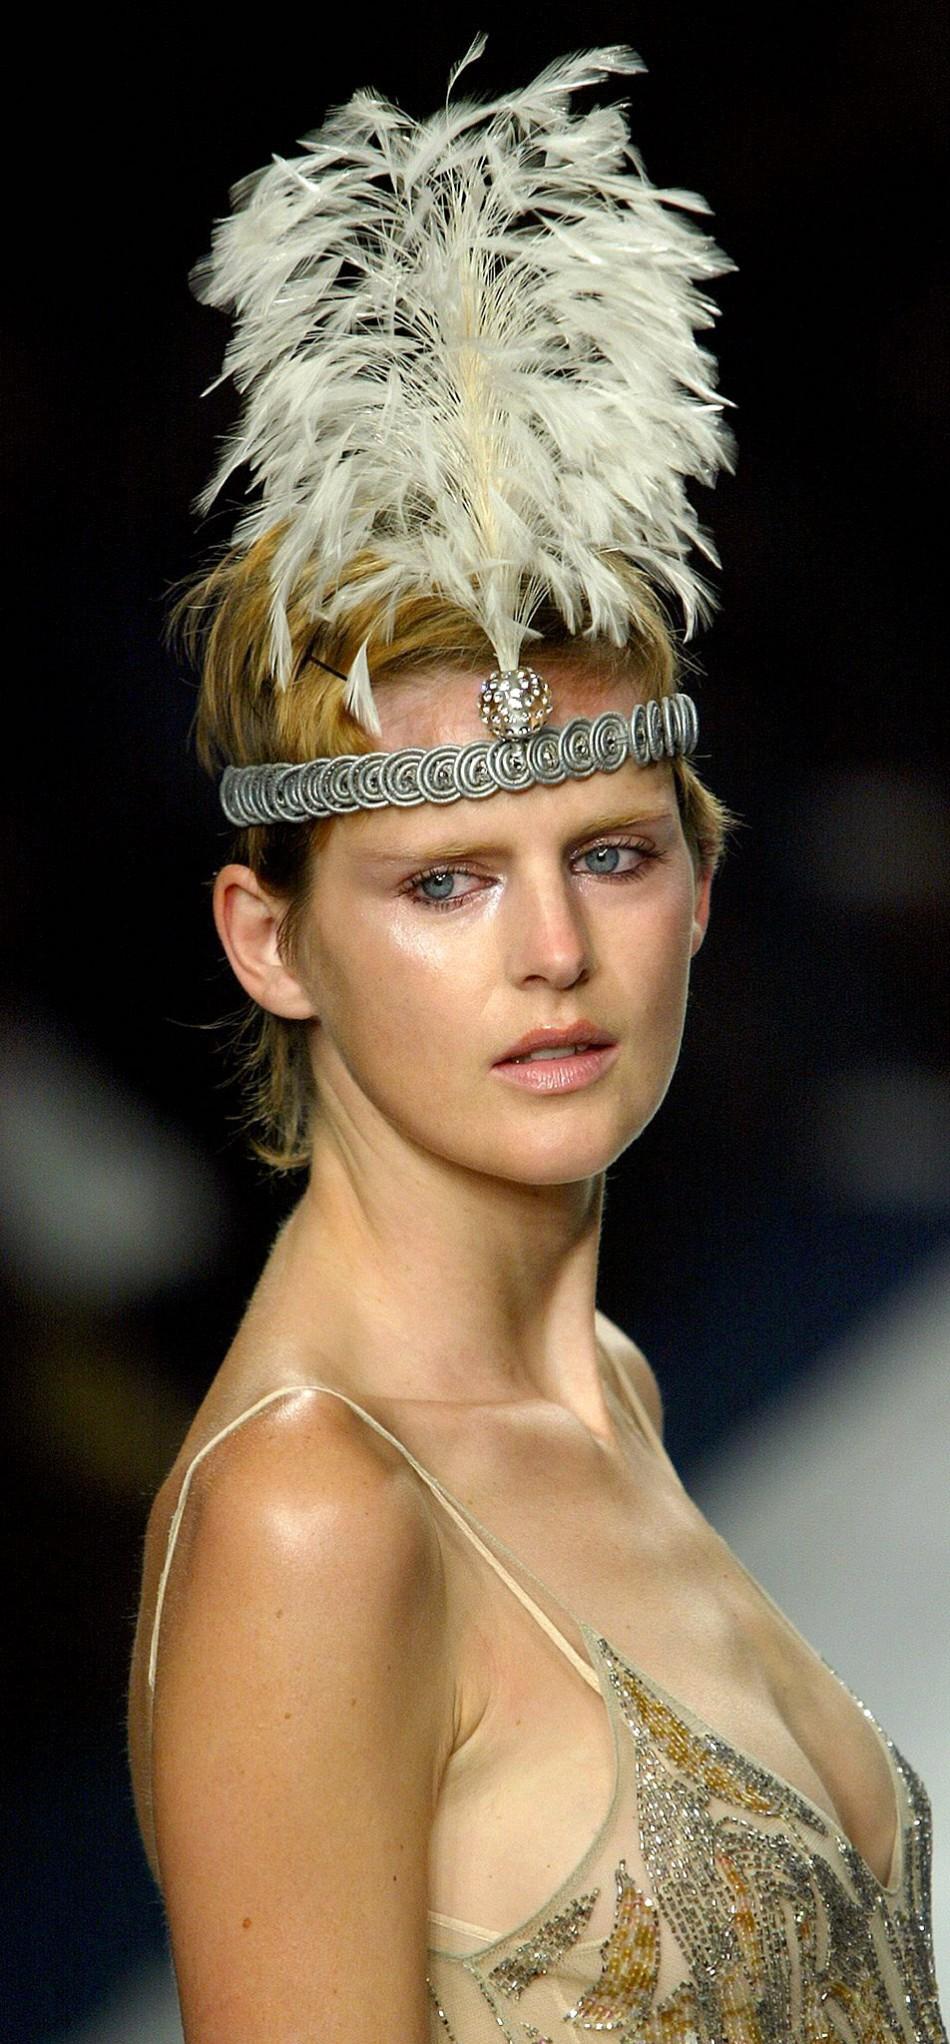 British Fashion Awards 2011: Model - Stella Tennant